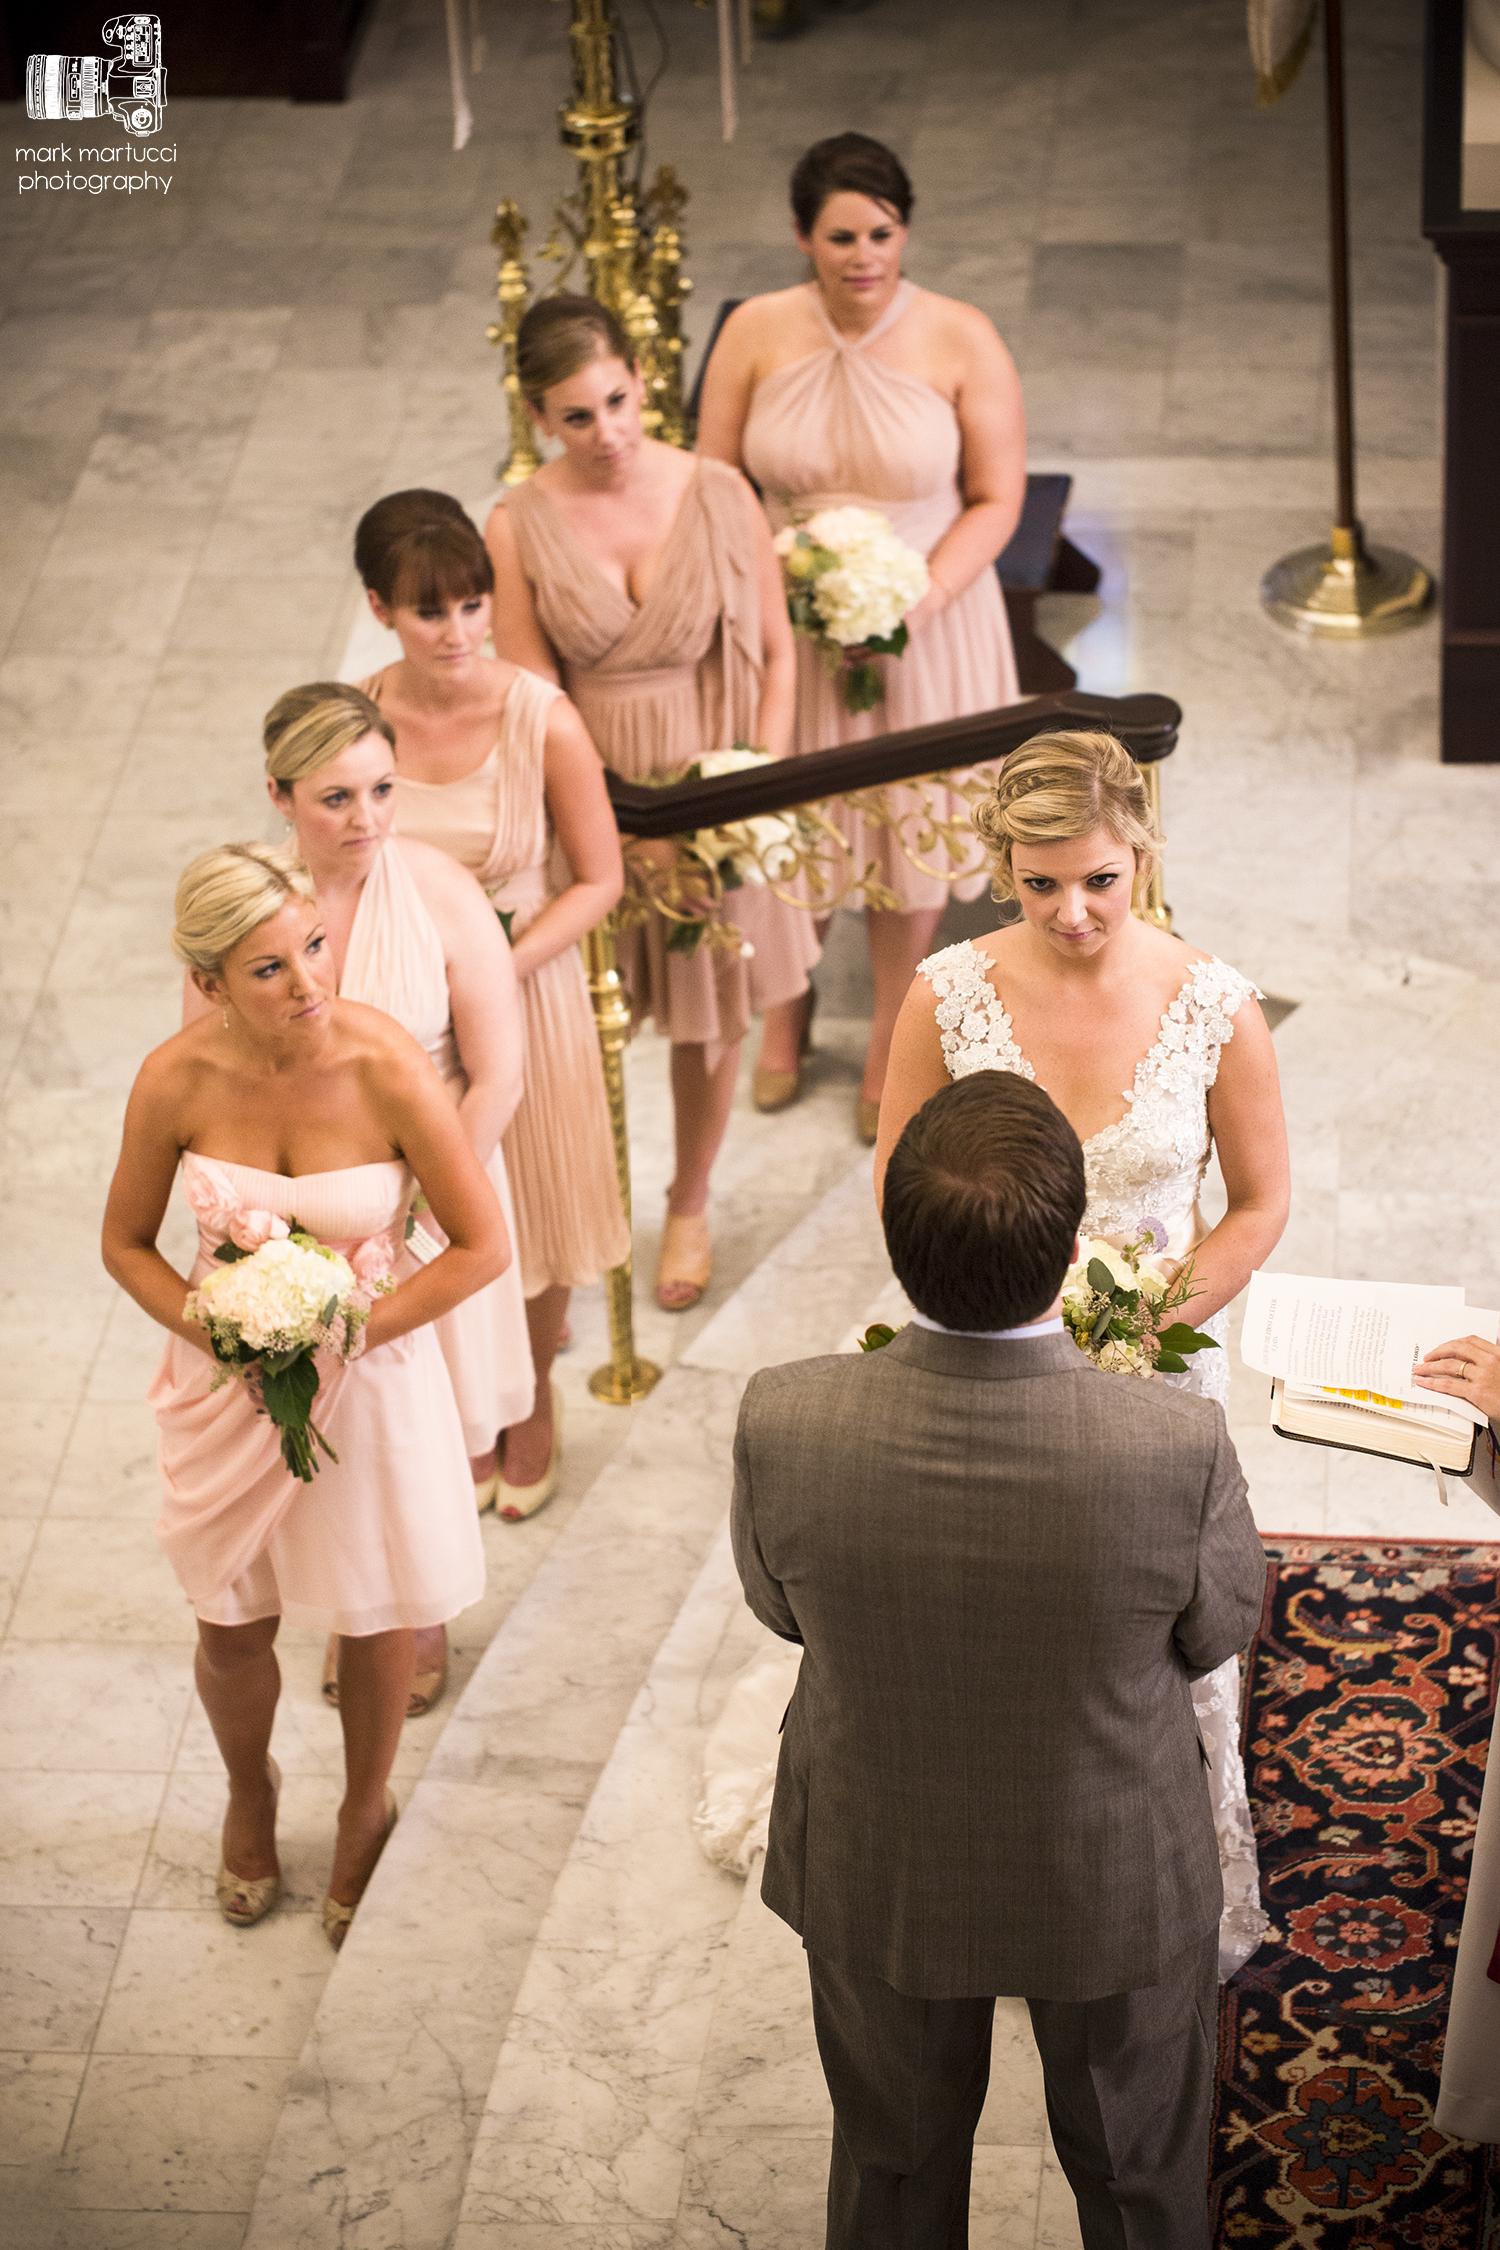 lauren and phil wedding mark small card 043.jpg